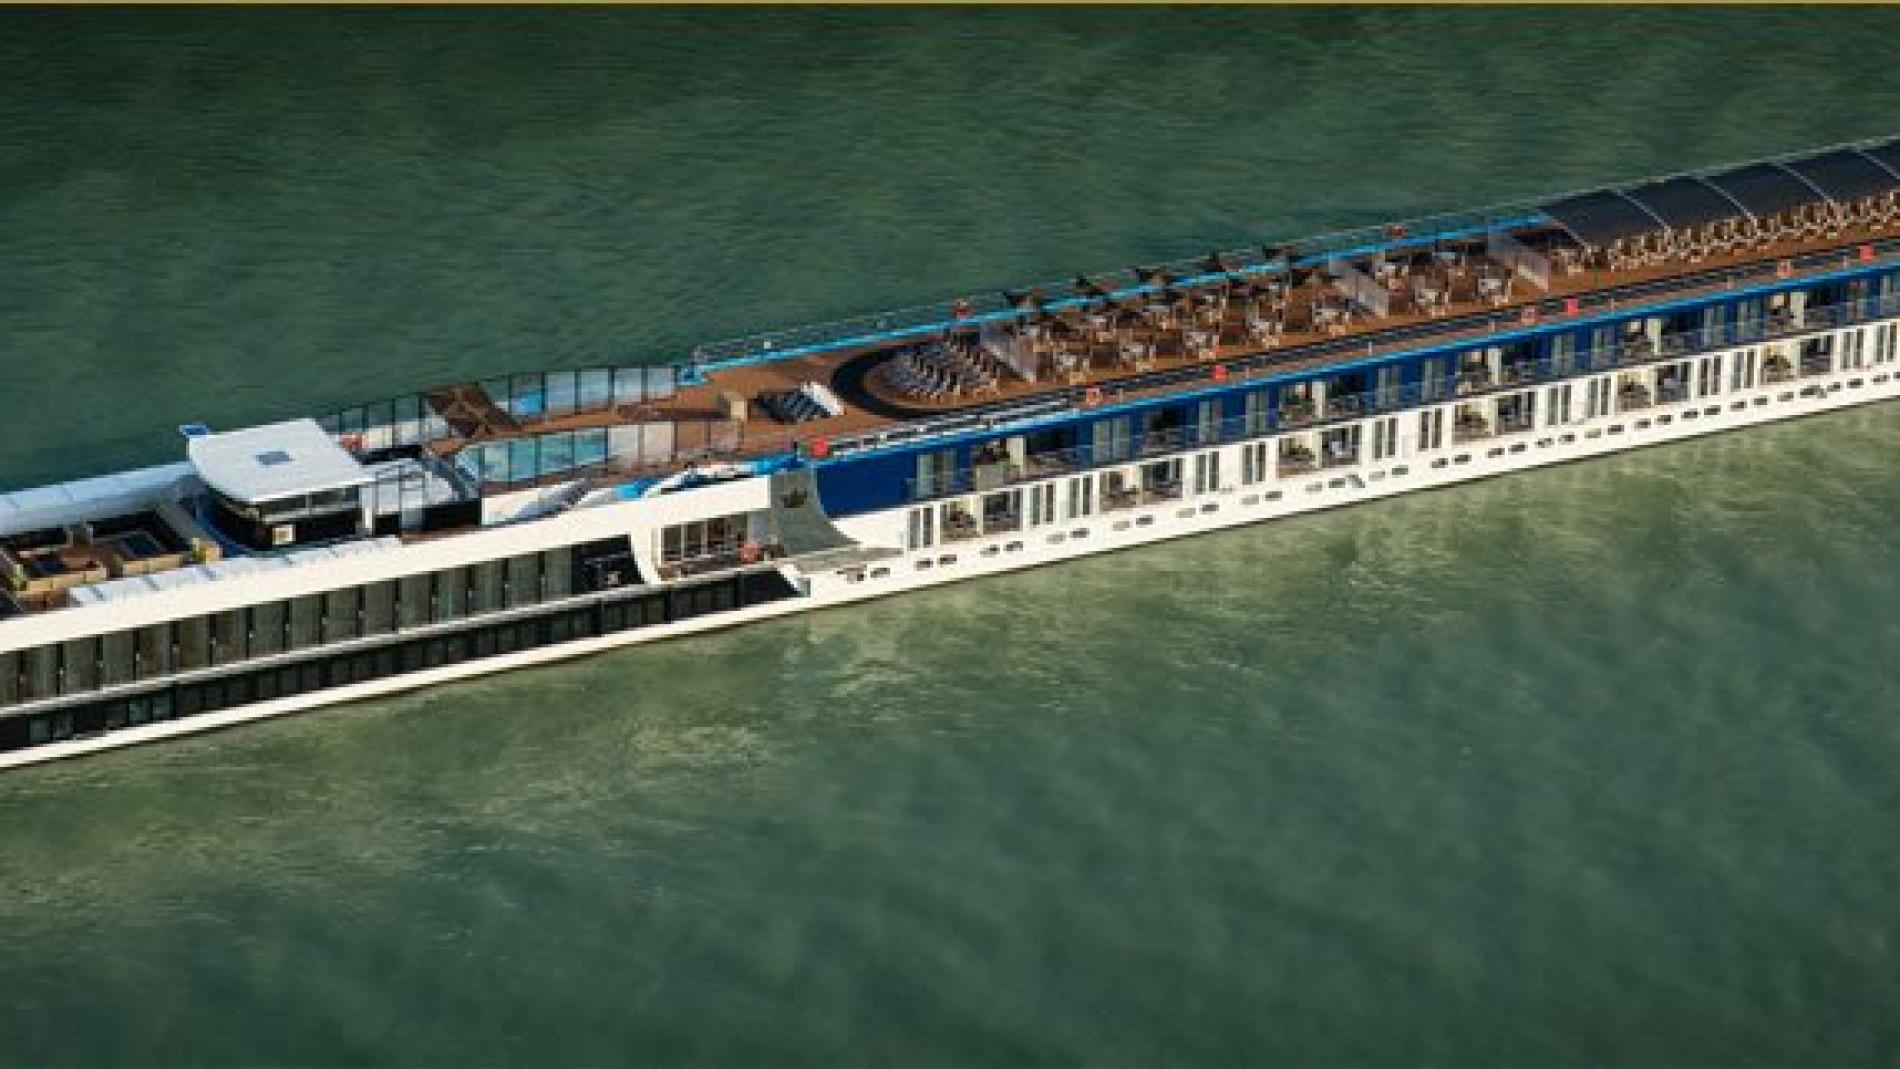 Cruise the Rhine aboard the AmaKristina